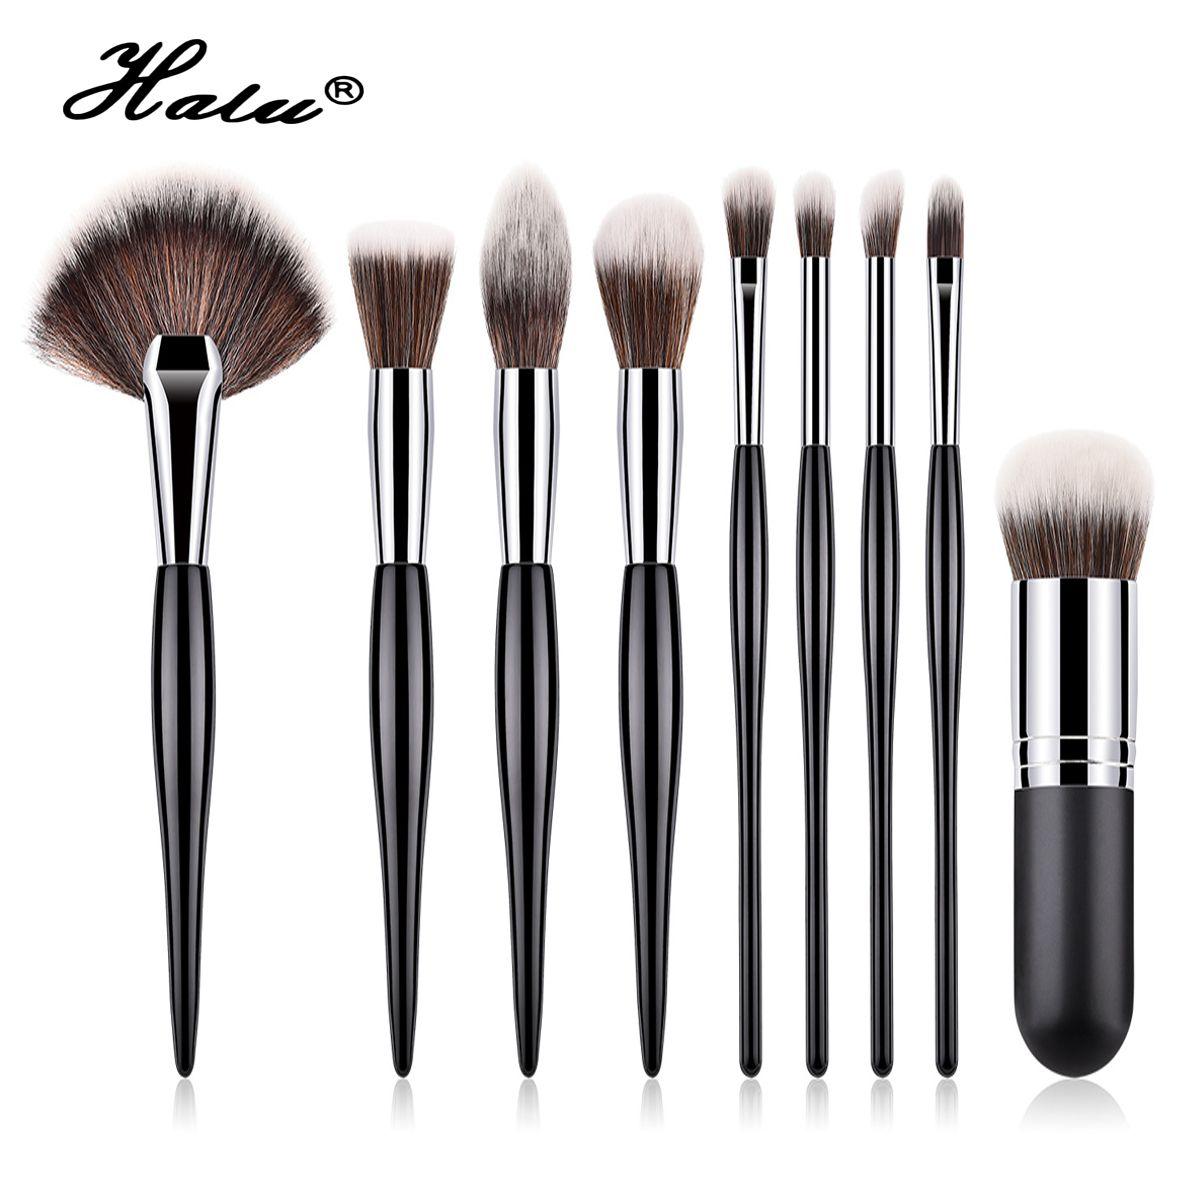 Popular Brand 10pcs Beauty Leg Make Up Brush Set Fan Eyeshadow Eyeliner Eyebrow Brush Eye Makeup Kits Colorful Mermaid Rose Gold Makeup Brush Makeup Beauty & Health